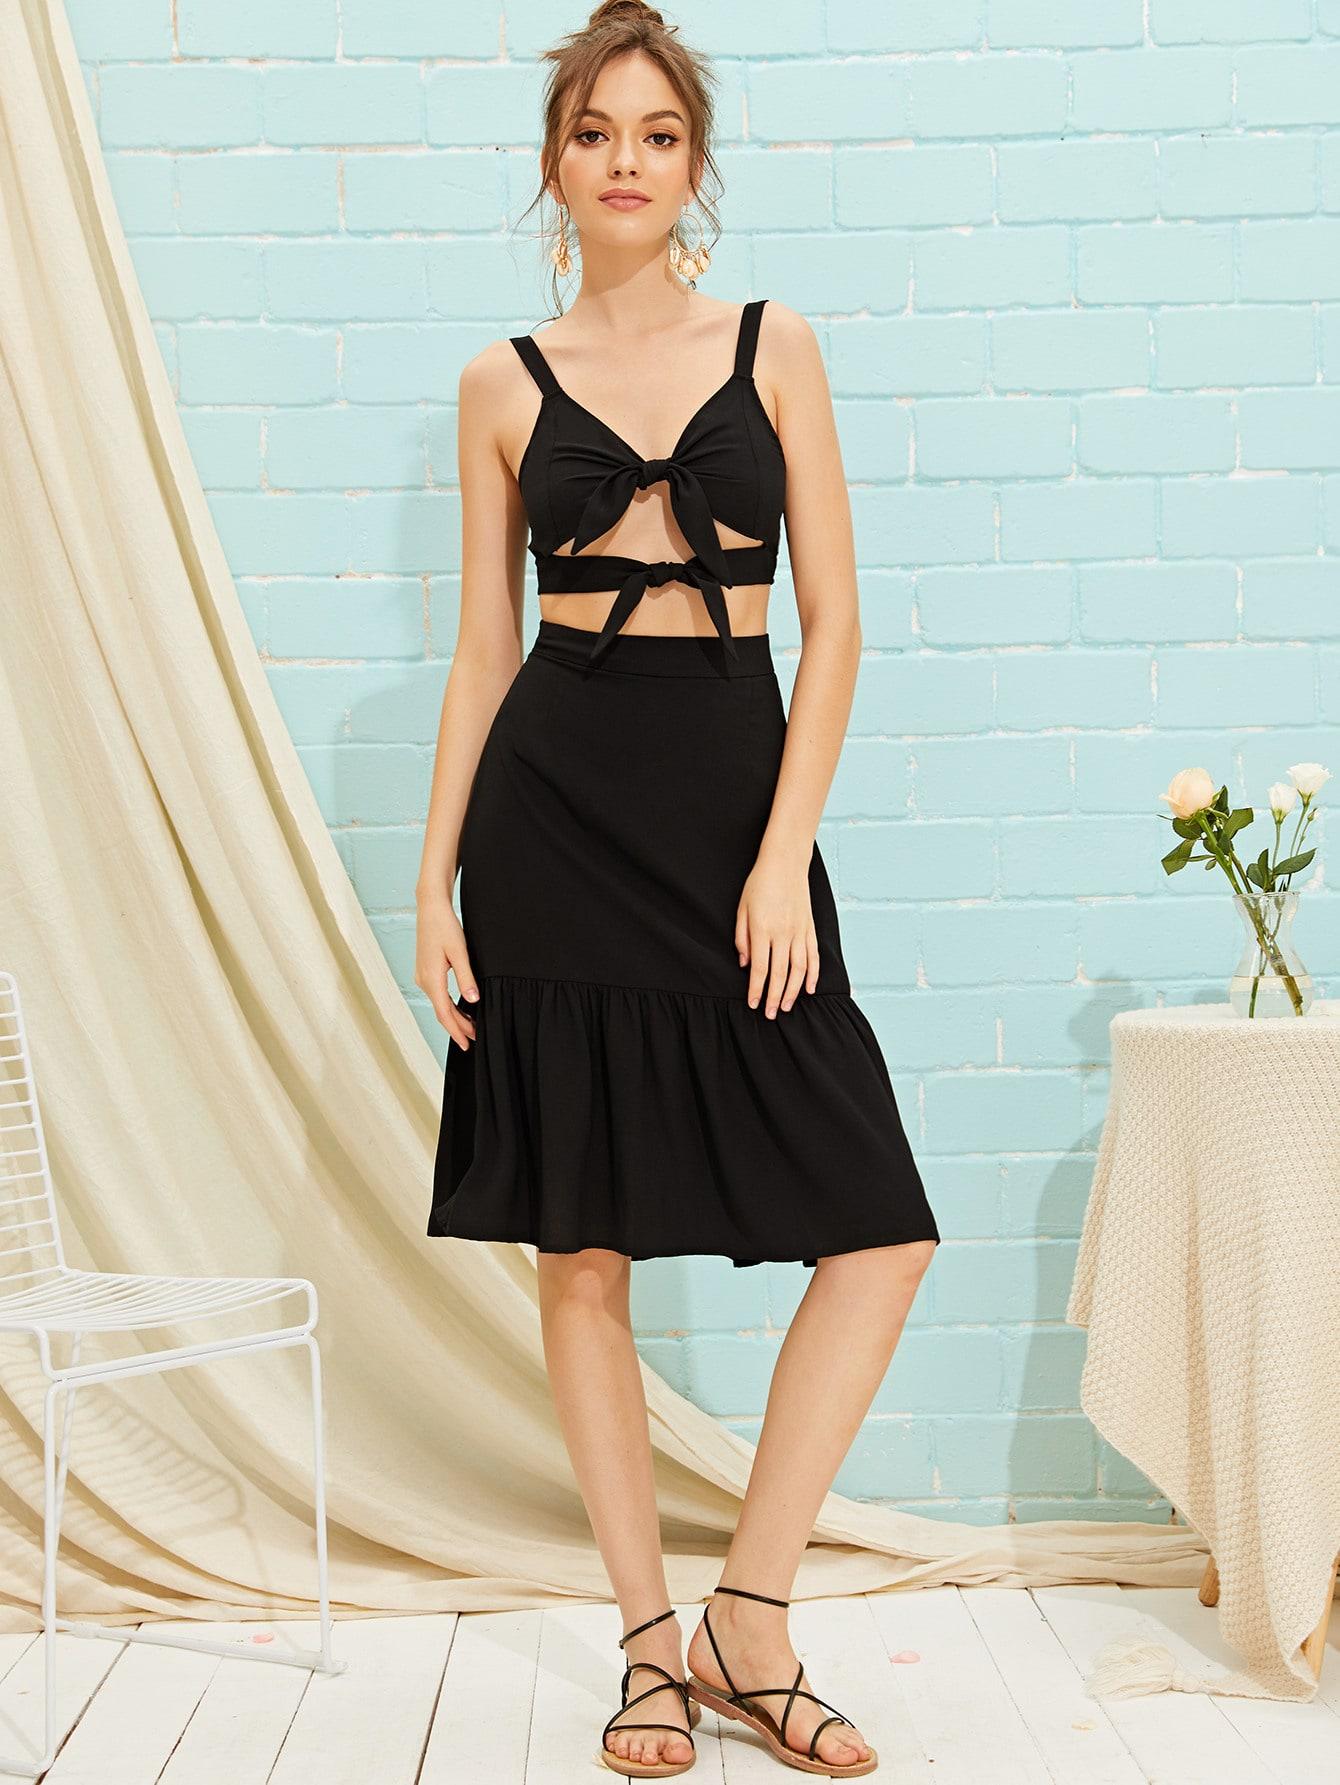 Фото - Топ на бретелях с узлом и юбка от SheIn черного цвета